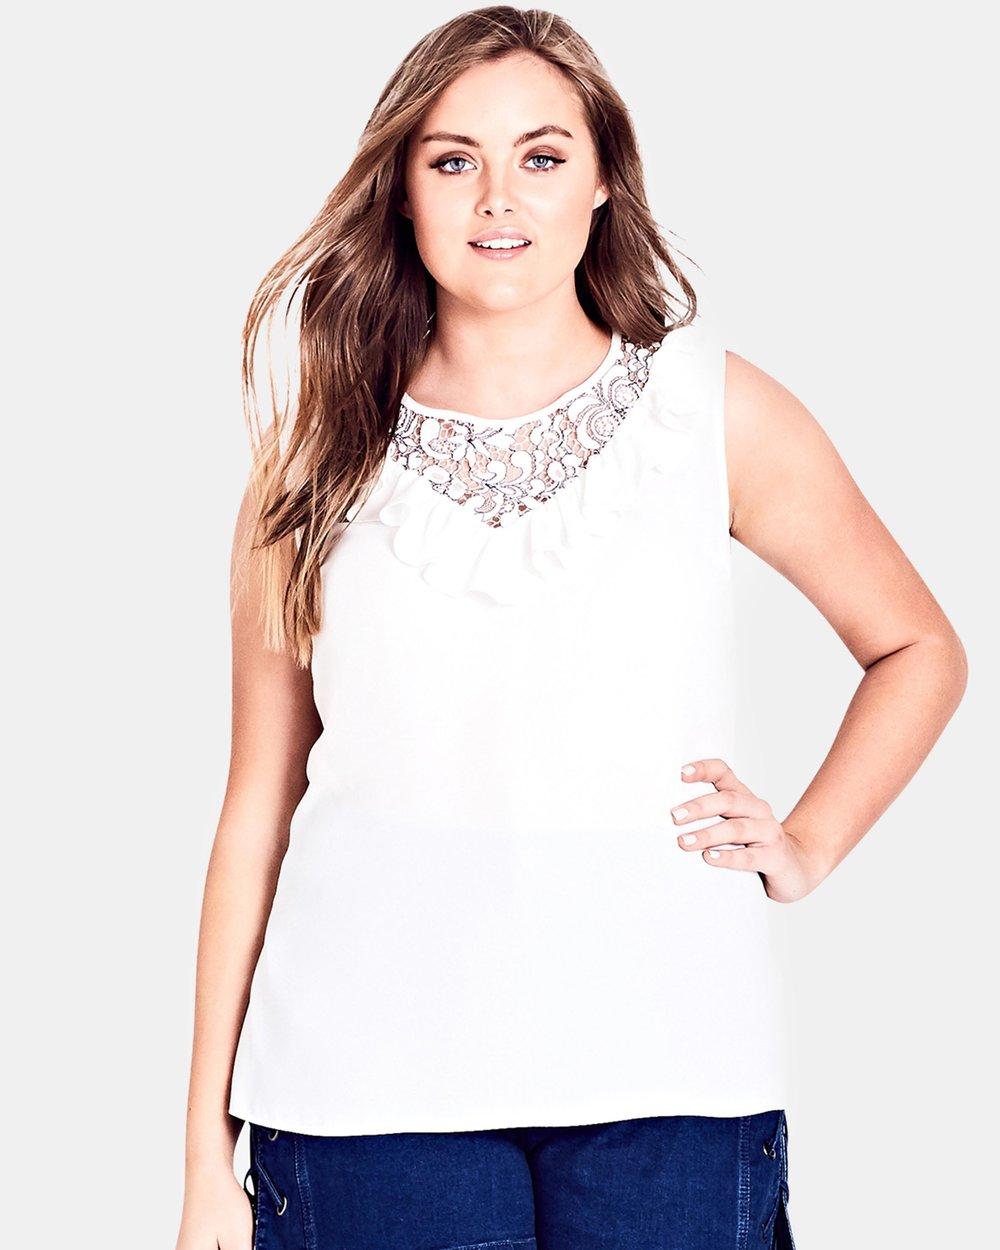 f749f270a Lace Romance Shirt by City Chic Online